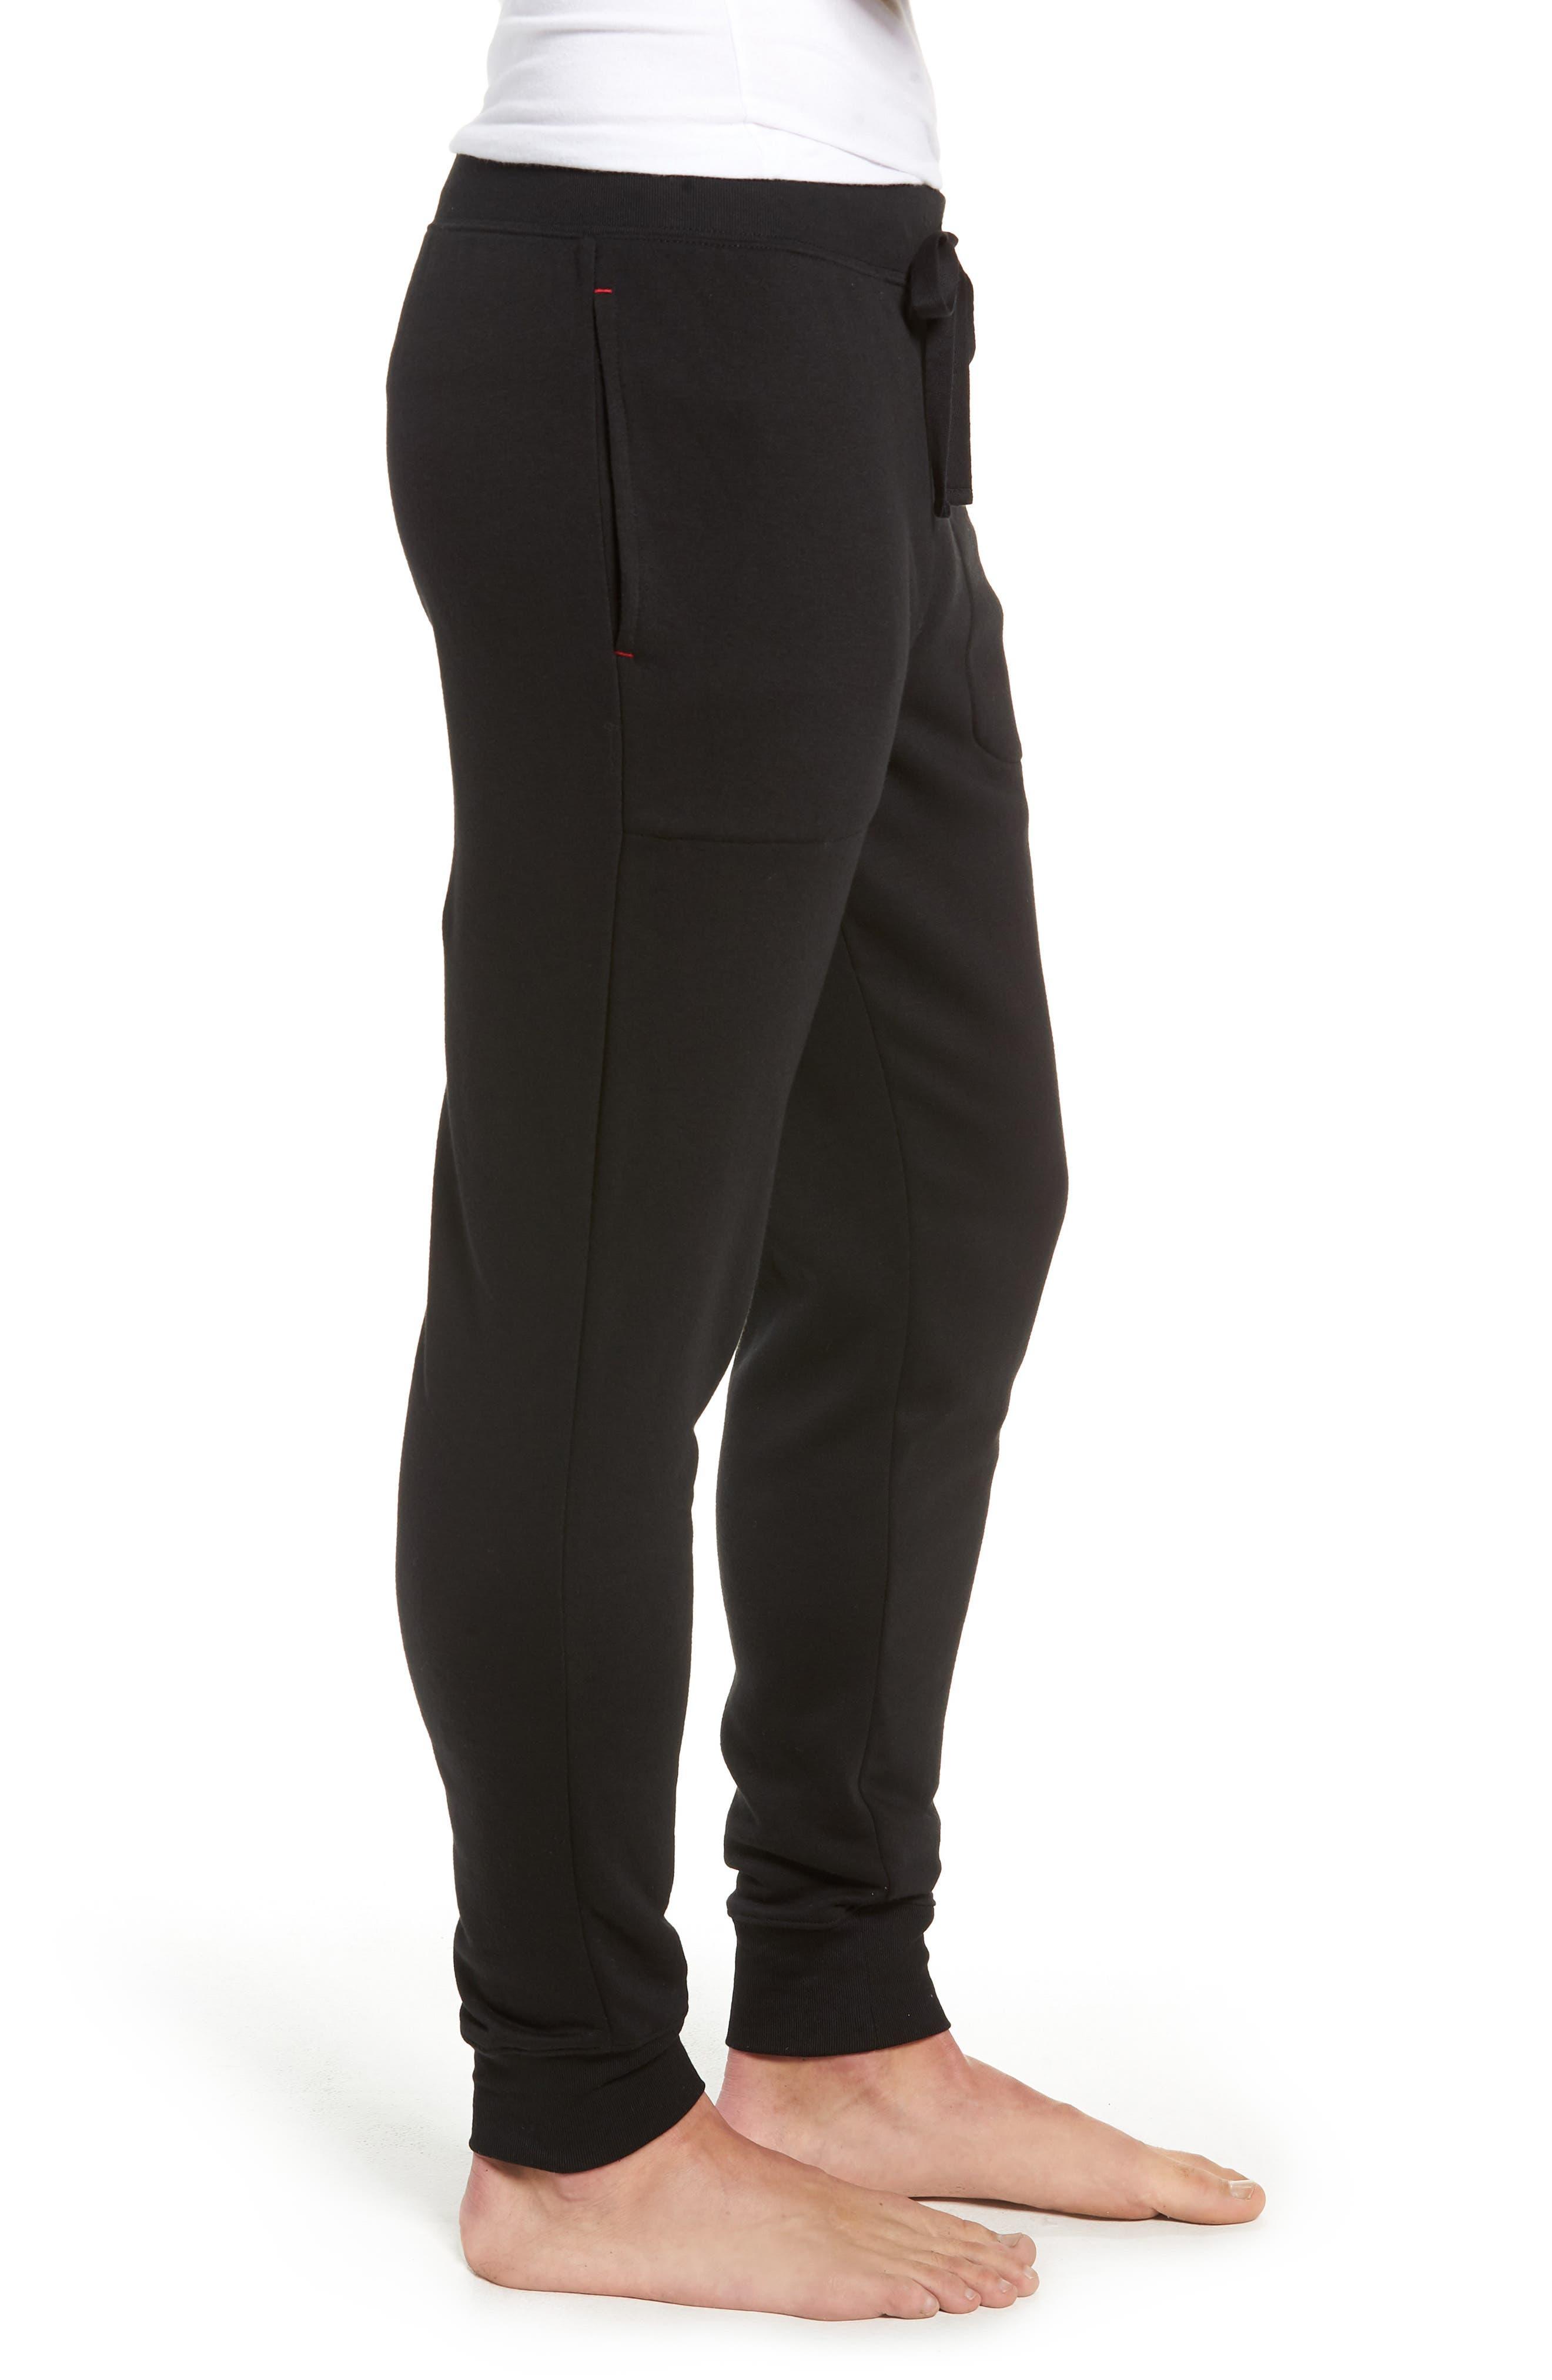 POLO RALPH LAUREN,                             Brushed Jersey Cotton Blend Jogger Pants,                             Alternate thumbnail 3, color,                             POLO BLACK